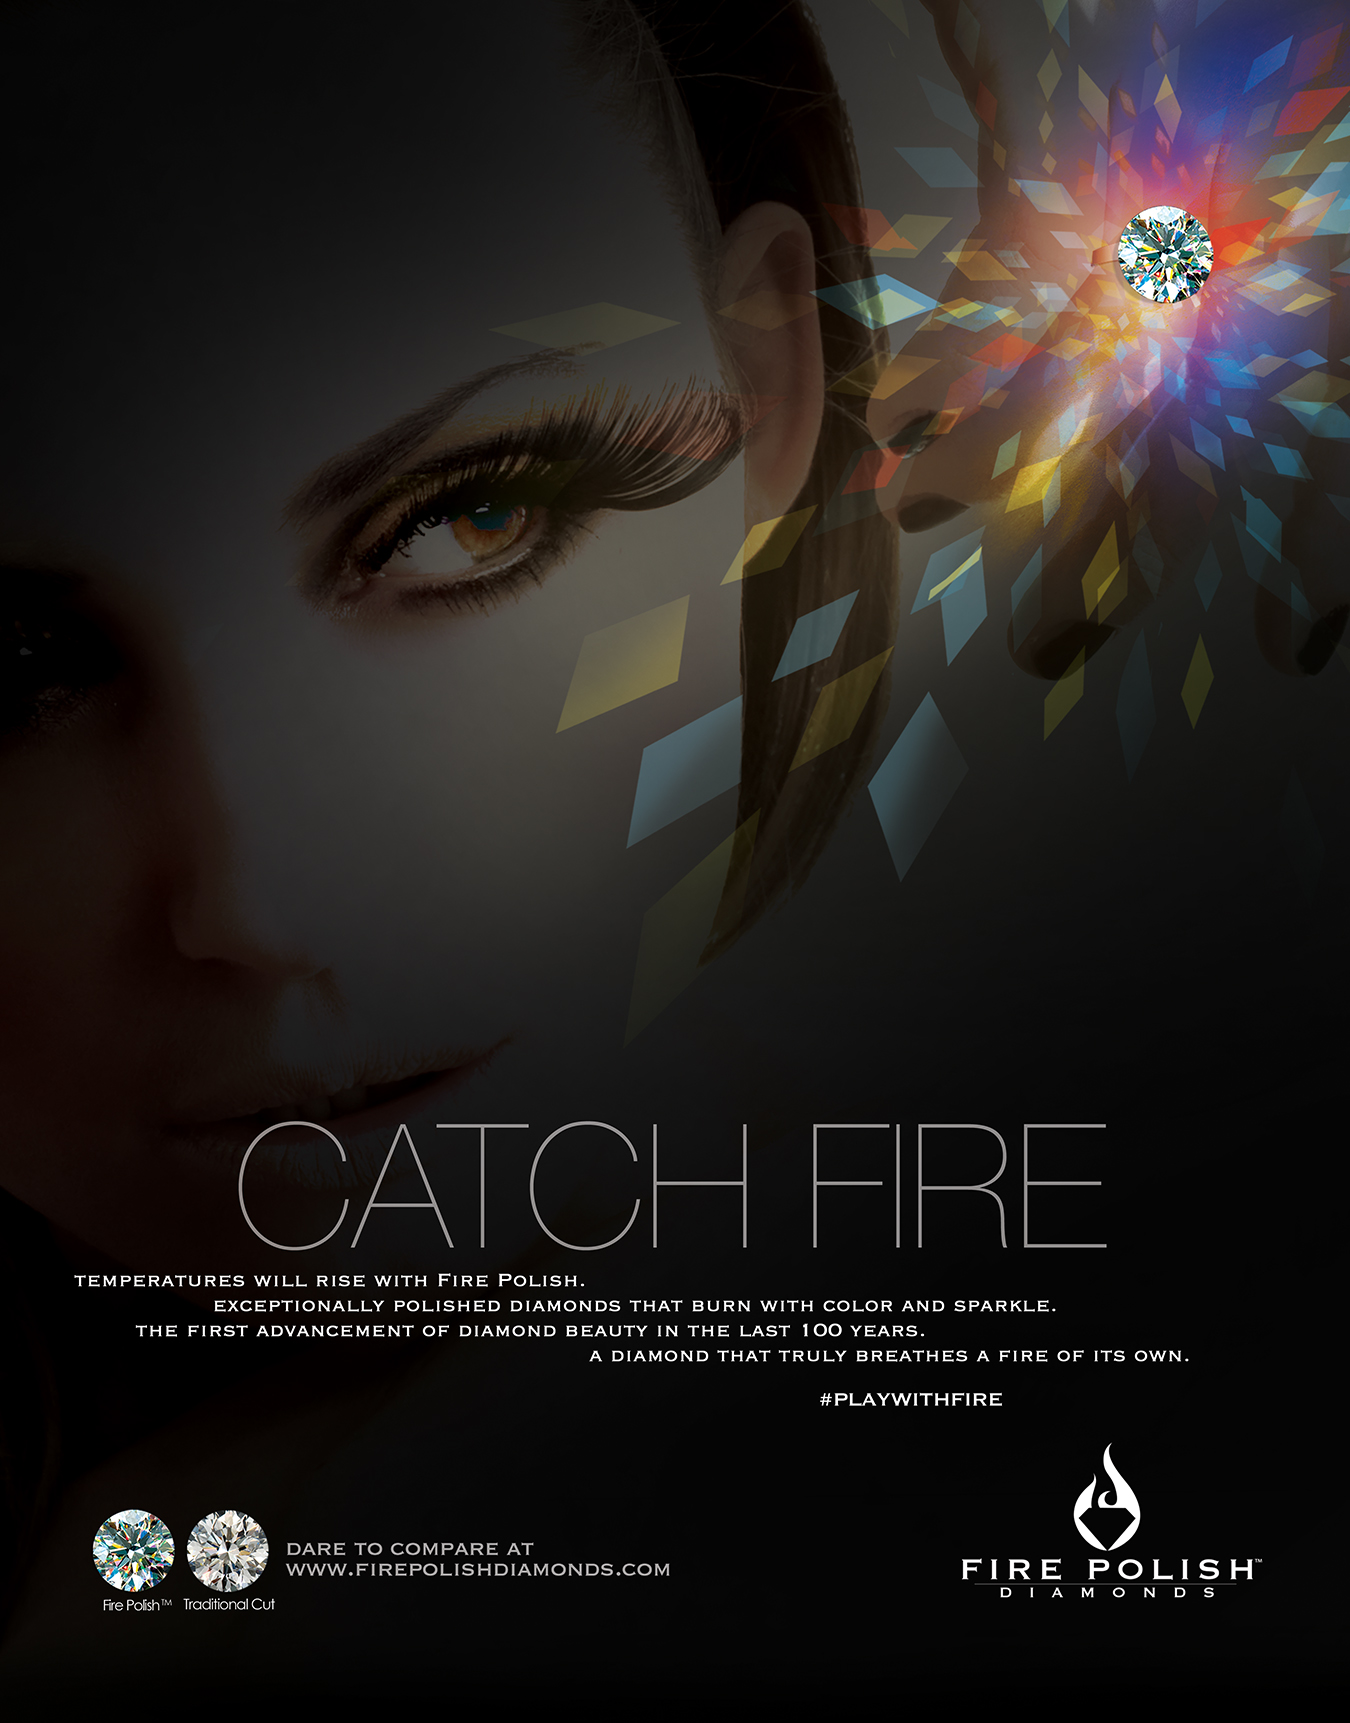 fire polish diamonds ad2